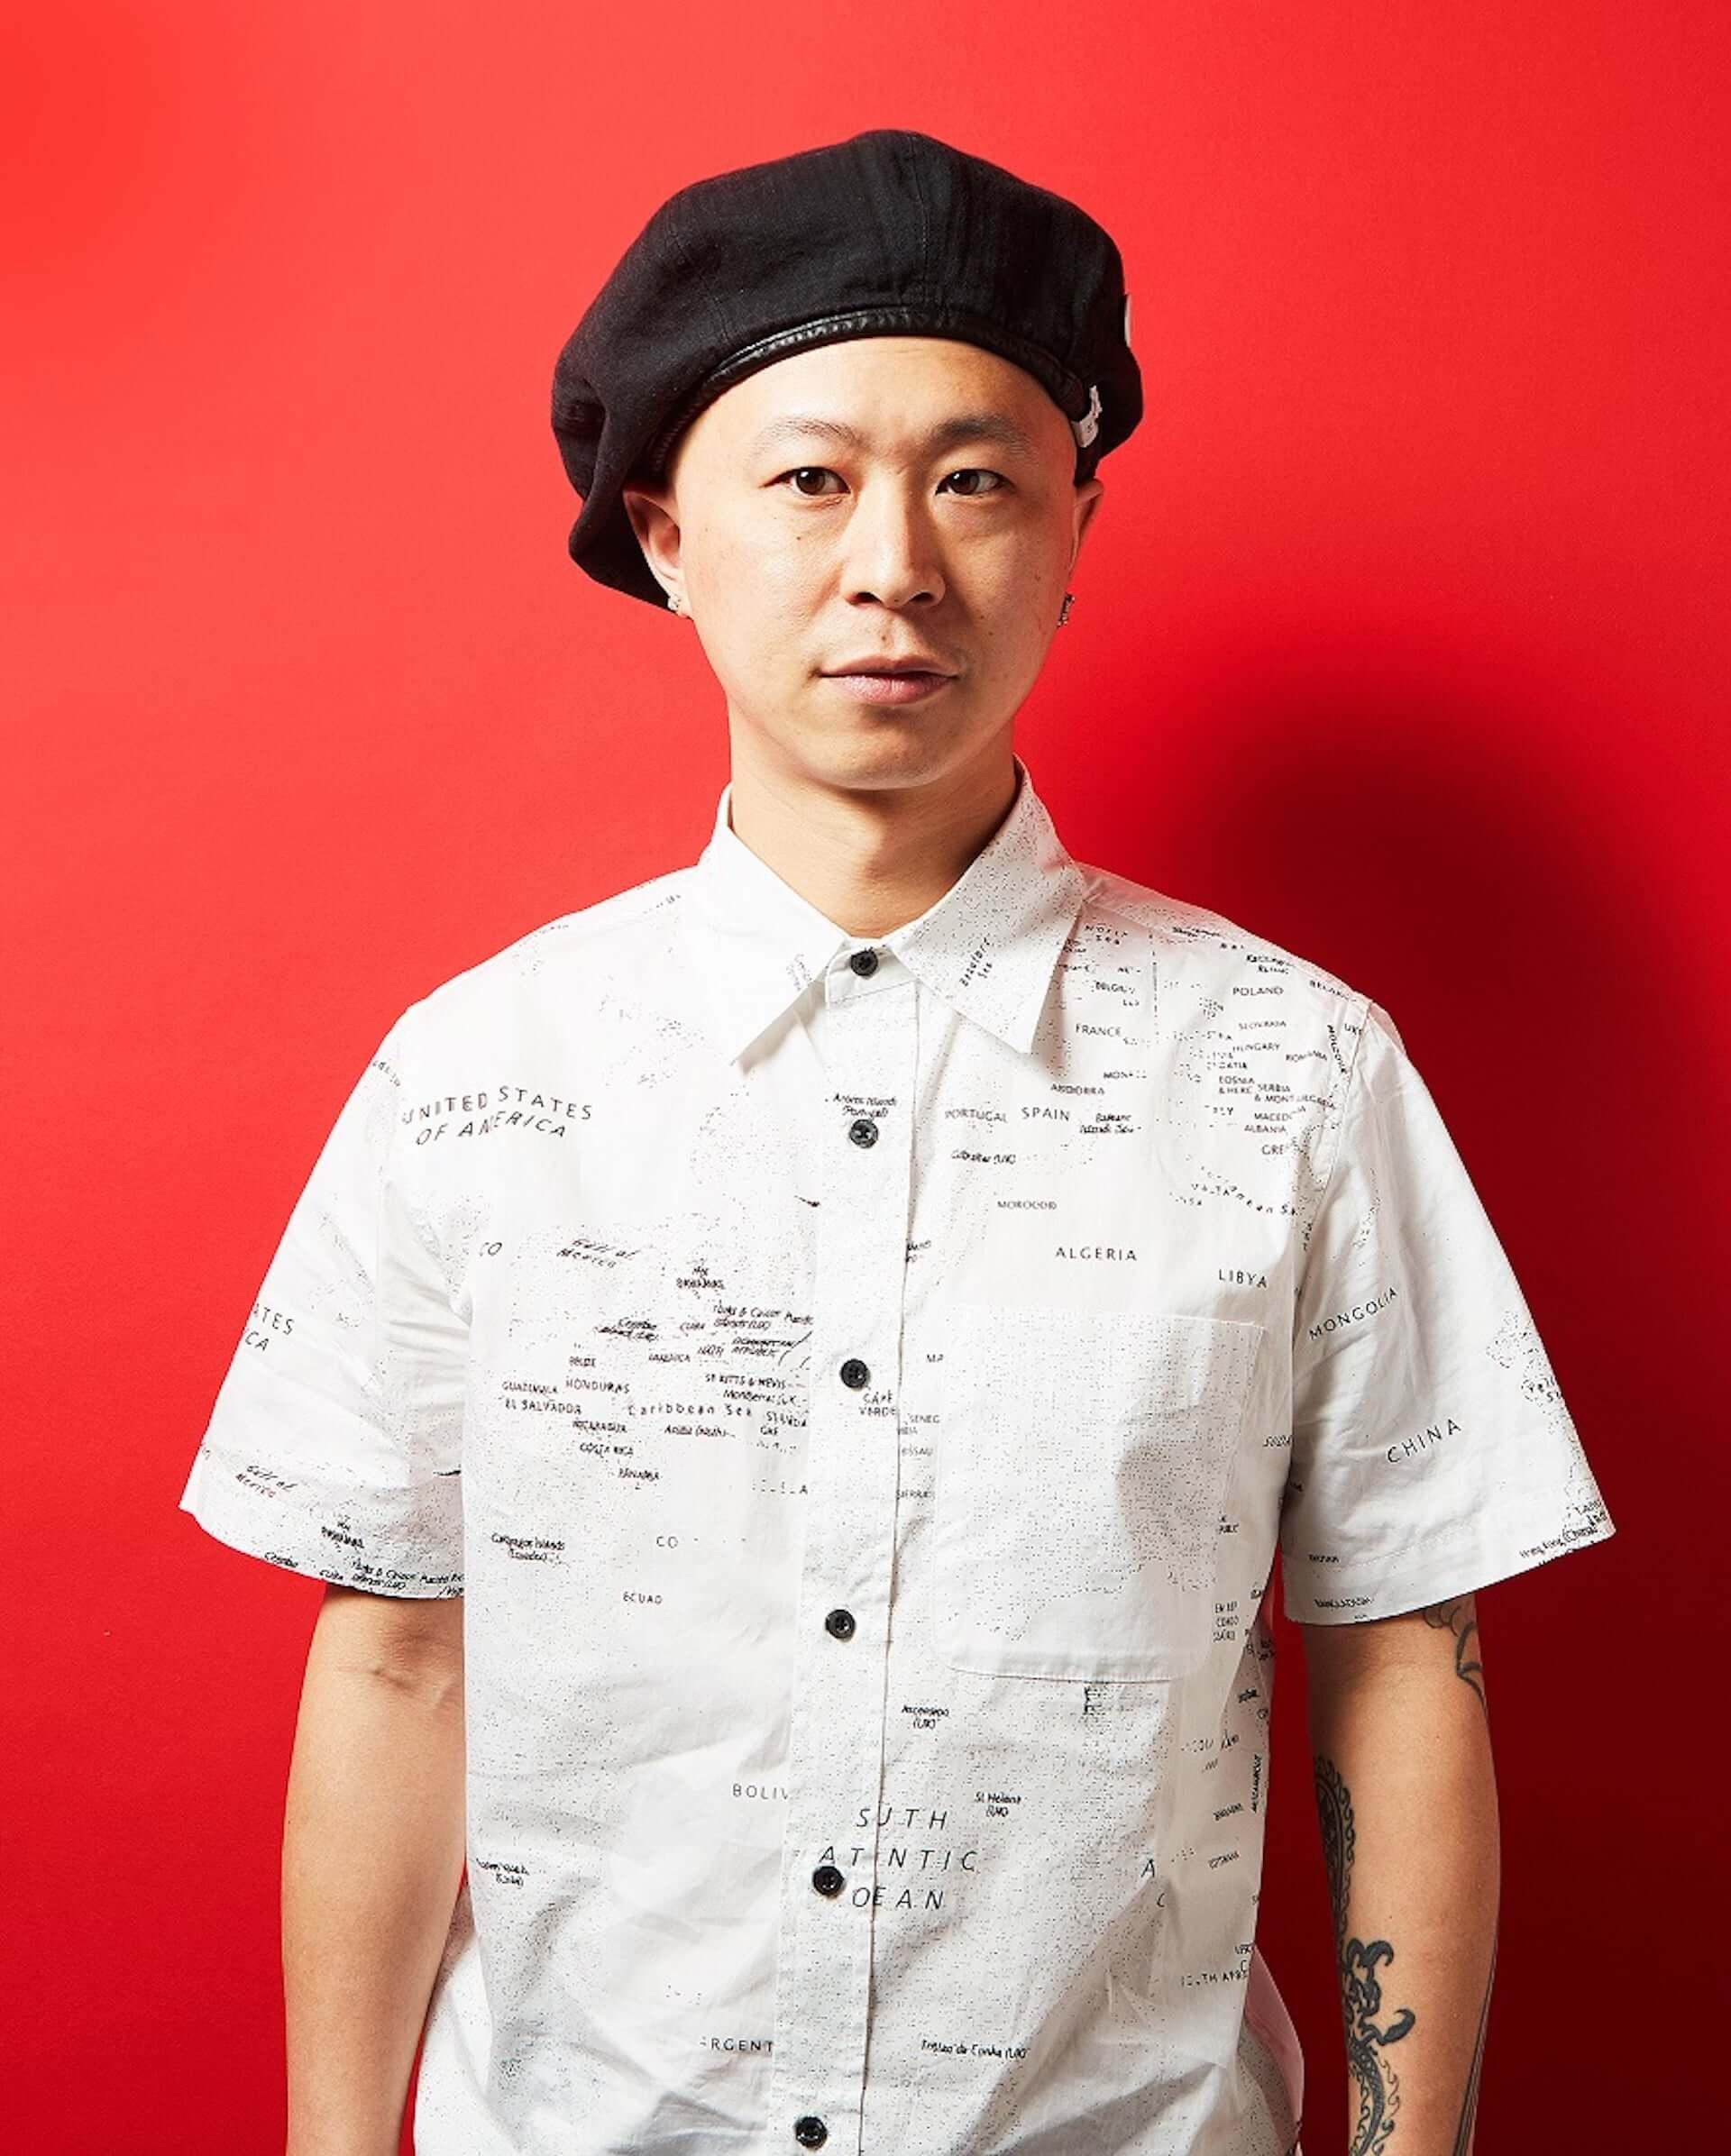 DJ BAKUが映画『VIDEOPHOBIA』のEDテーマ曲をリリース!Jin Dogg、Tomy Wealth、ヌンチャクをフィーチャー music200916_baku_1-1920x2392